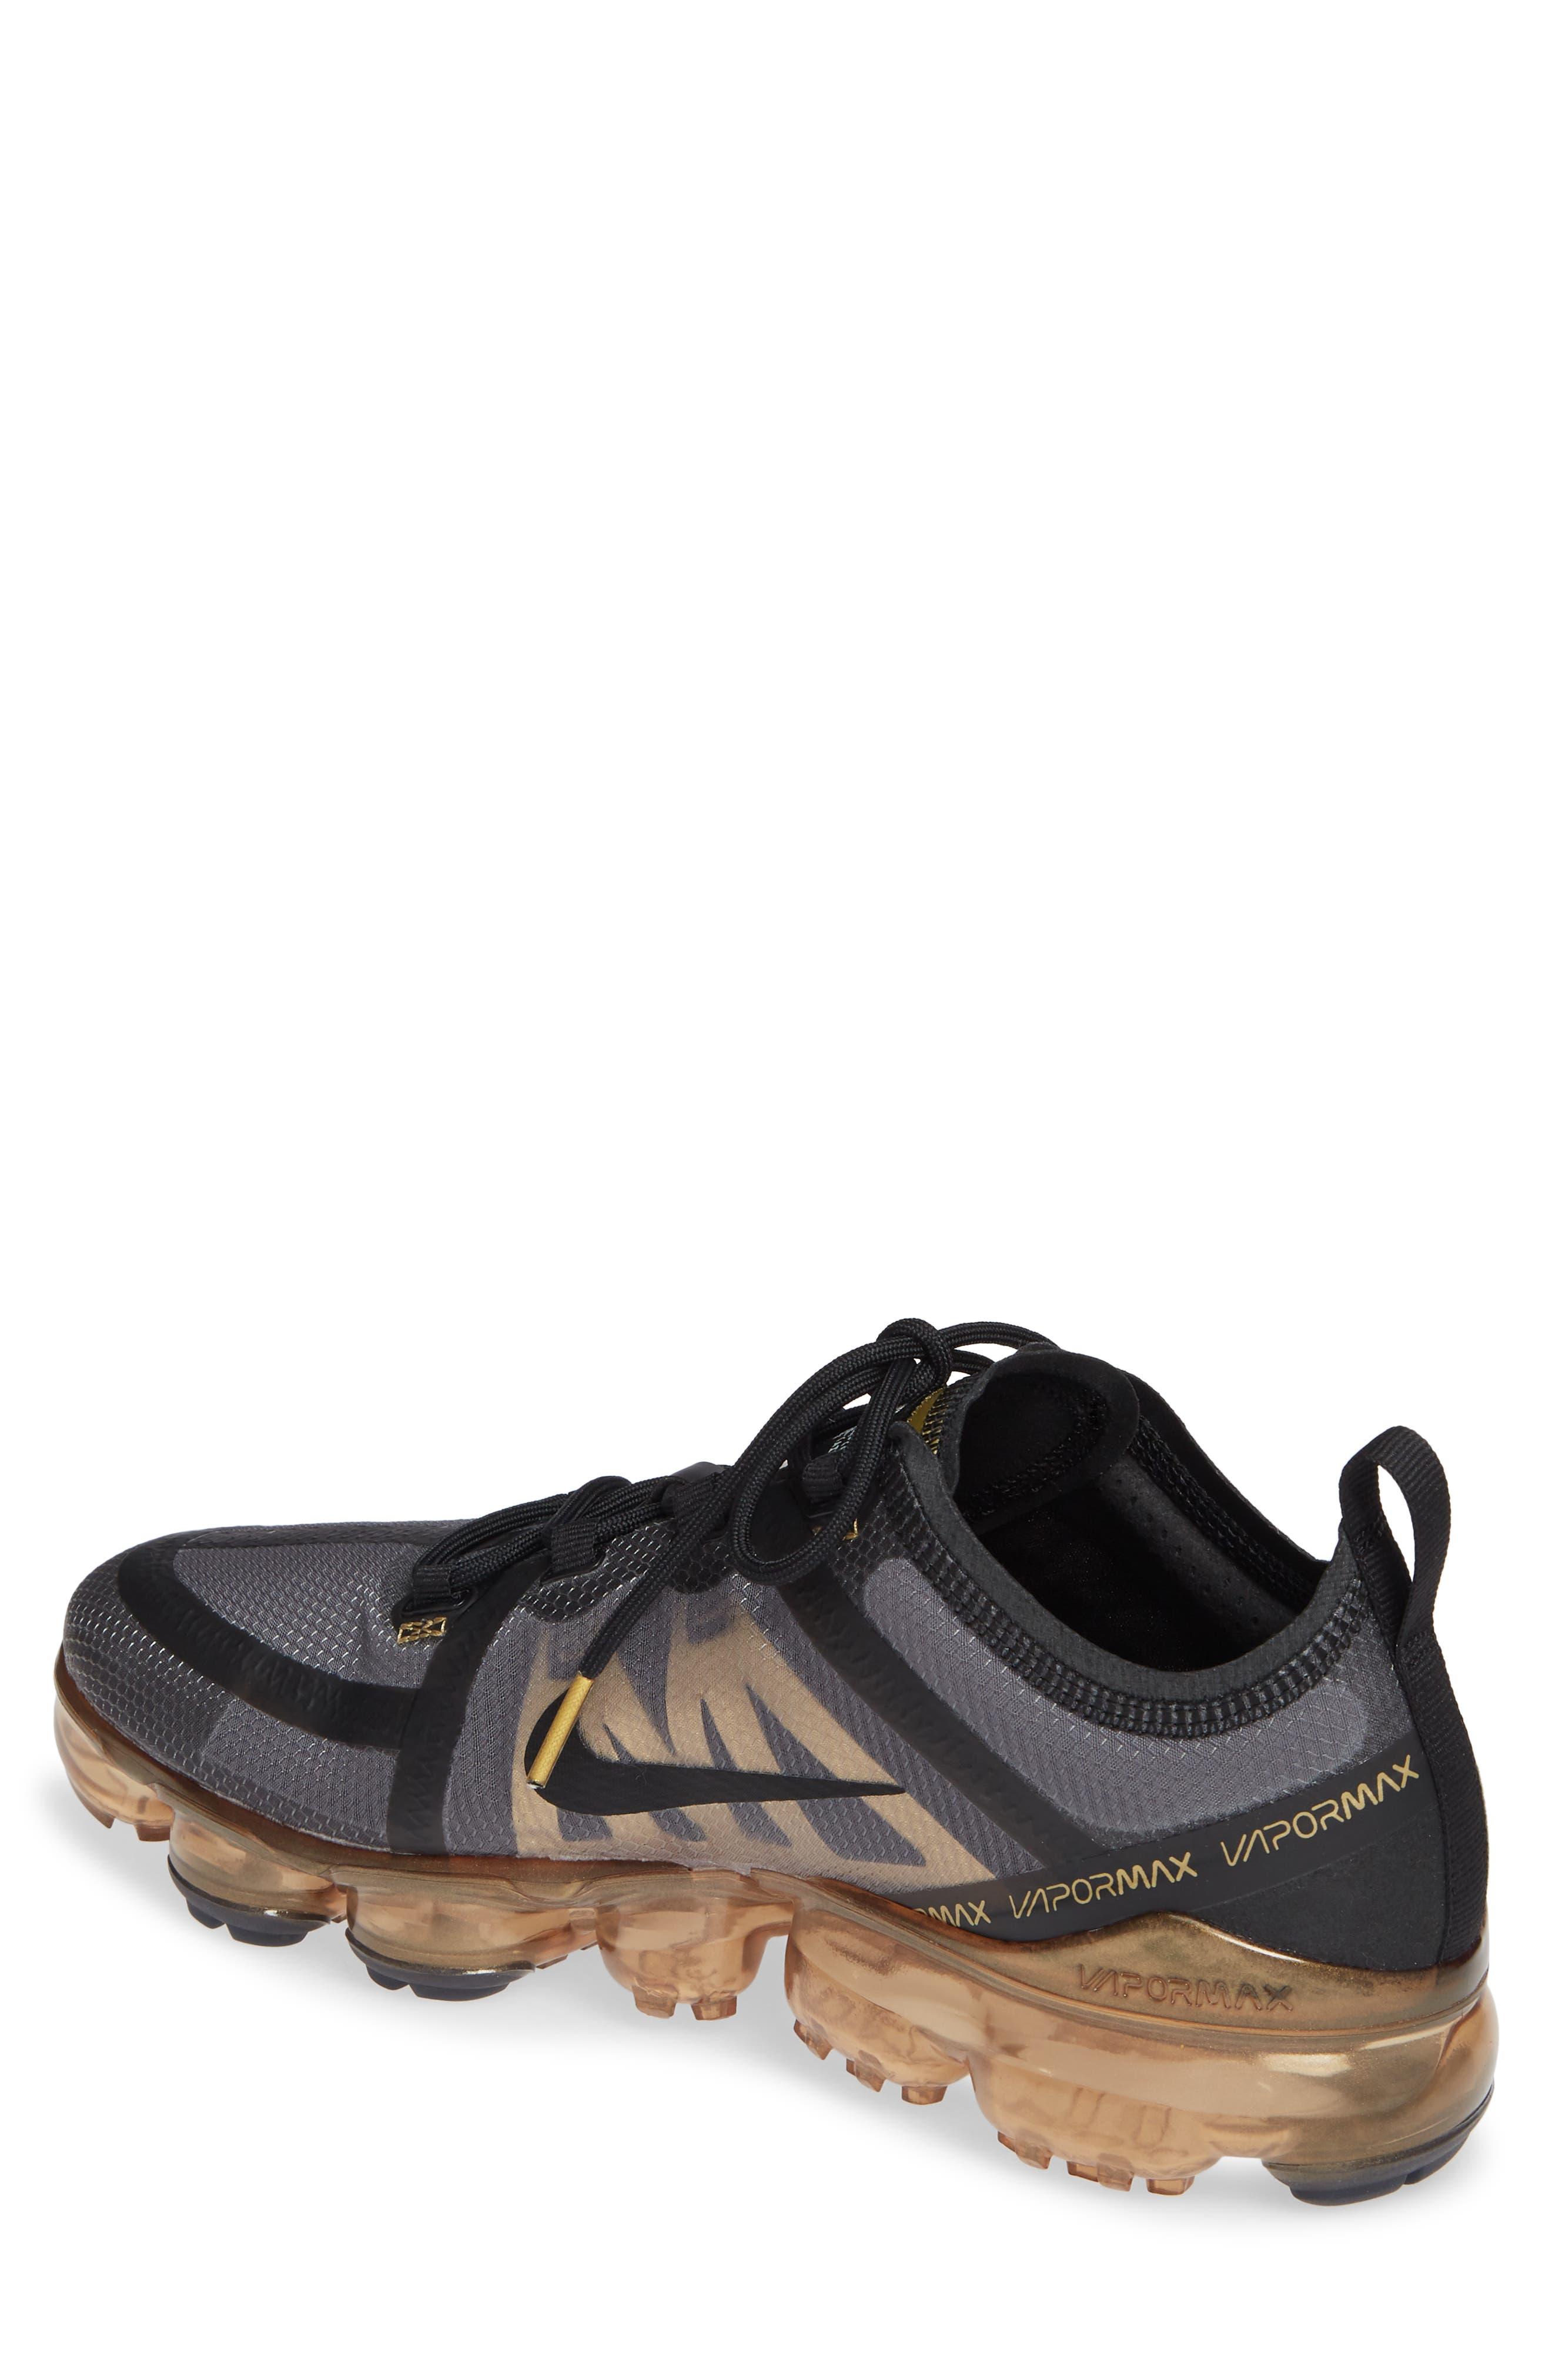 NIKE,                             Air VaporMax 2019 Running Shoe,                             Alternate thumbnail 2, color,                             BLACK/ METALLIC GOLD